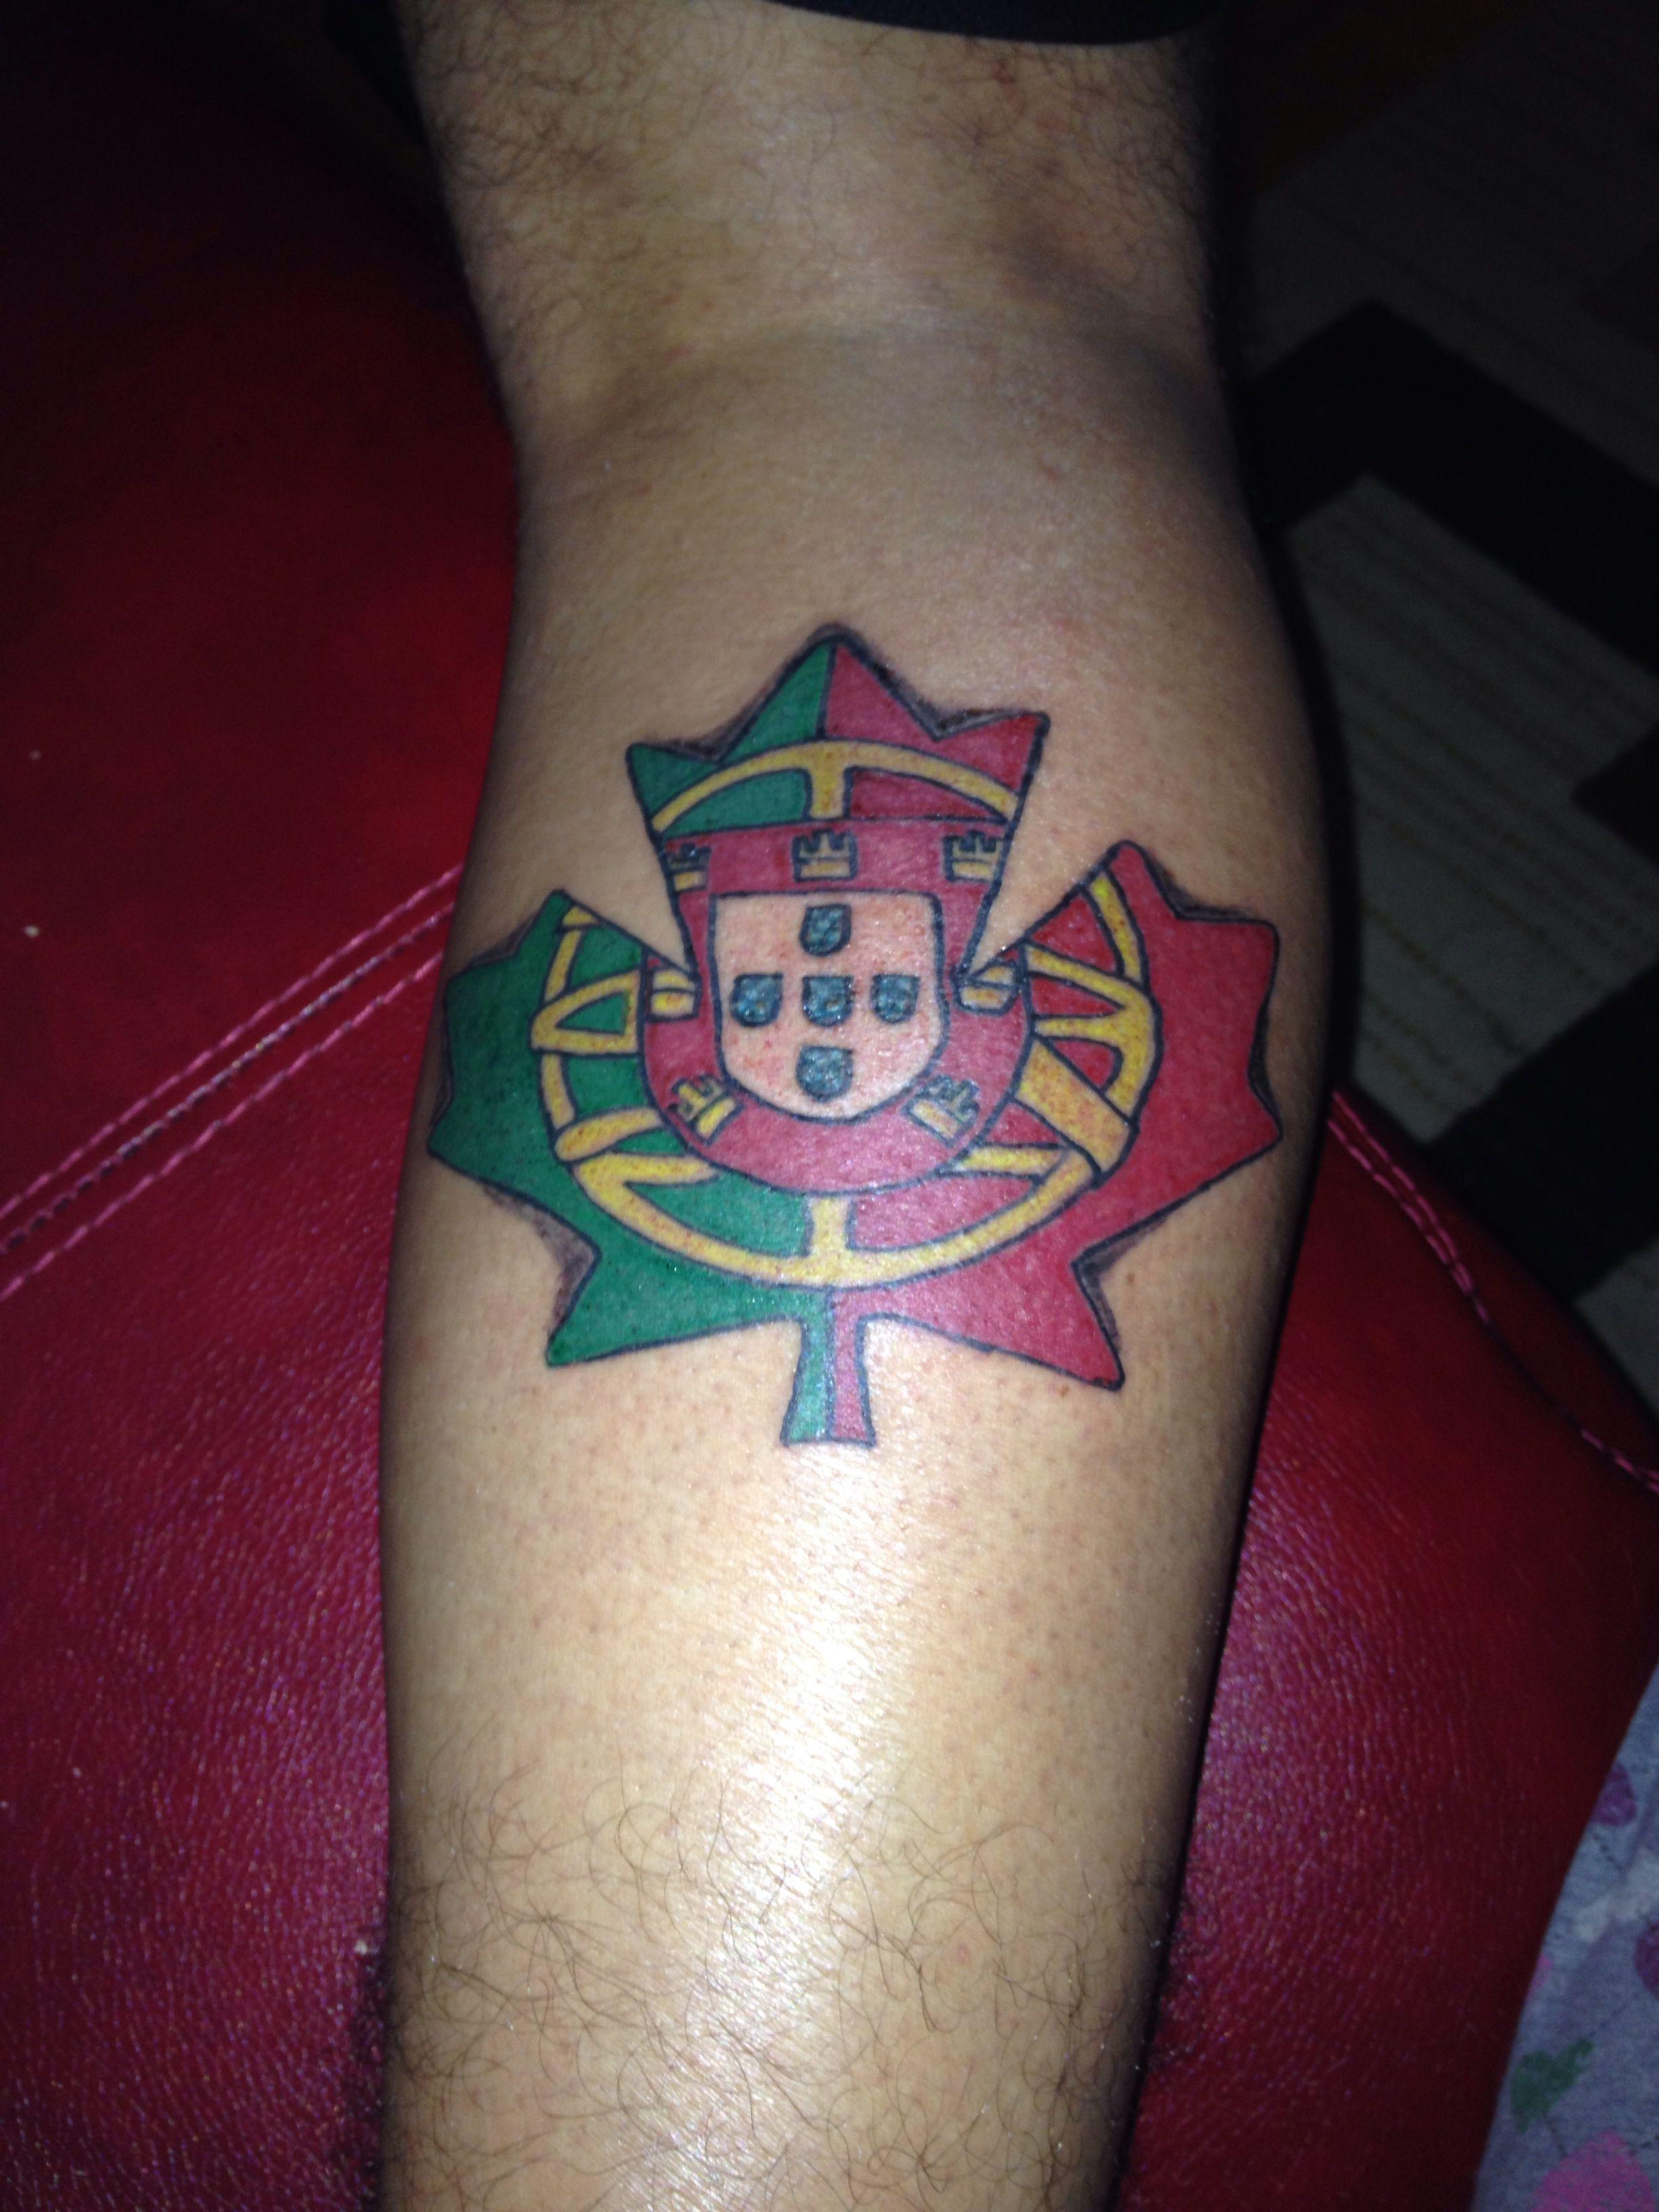 Portugese Canadian Tattoo I Love This Canadian Tattoo Tattoos Tatoos